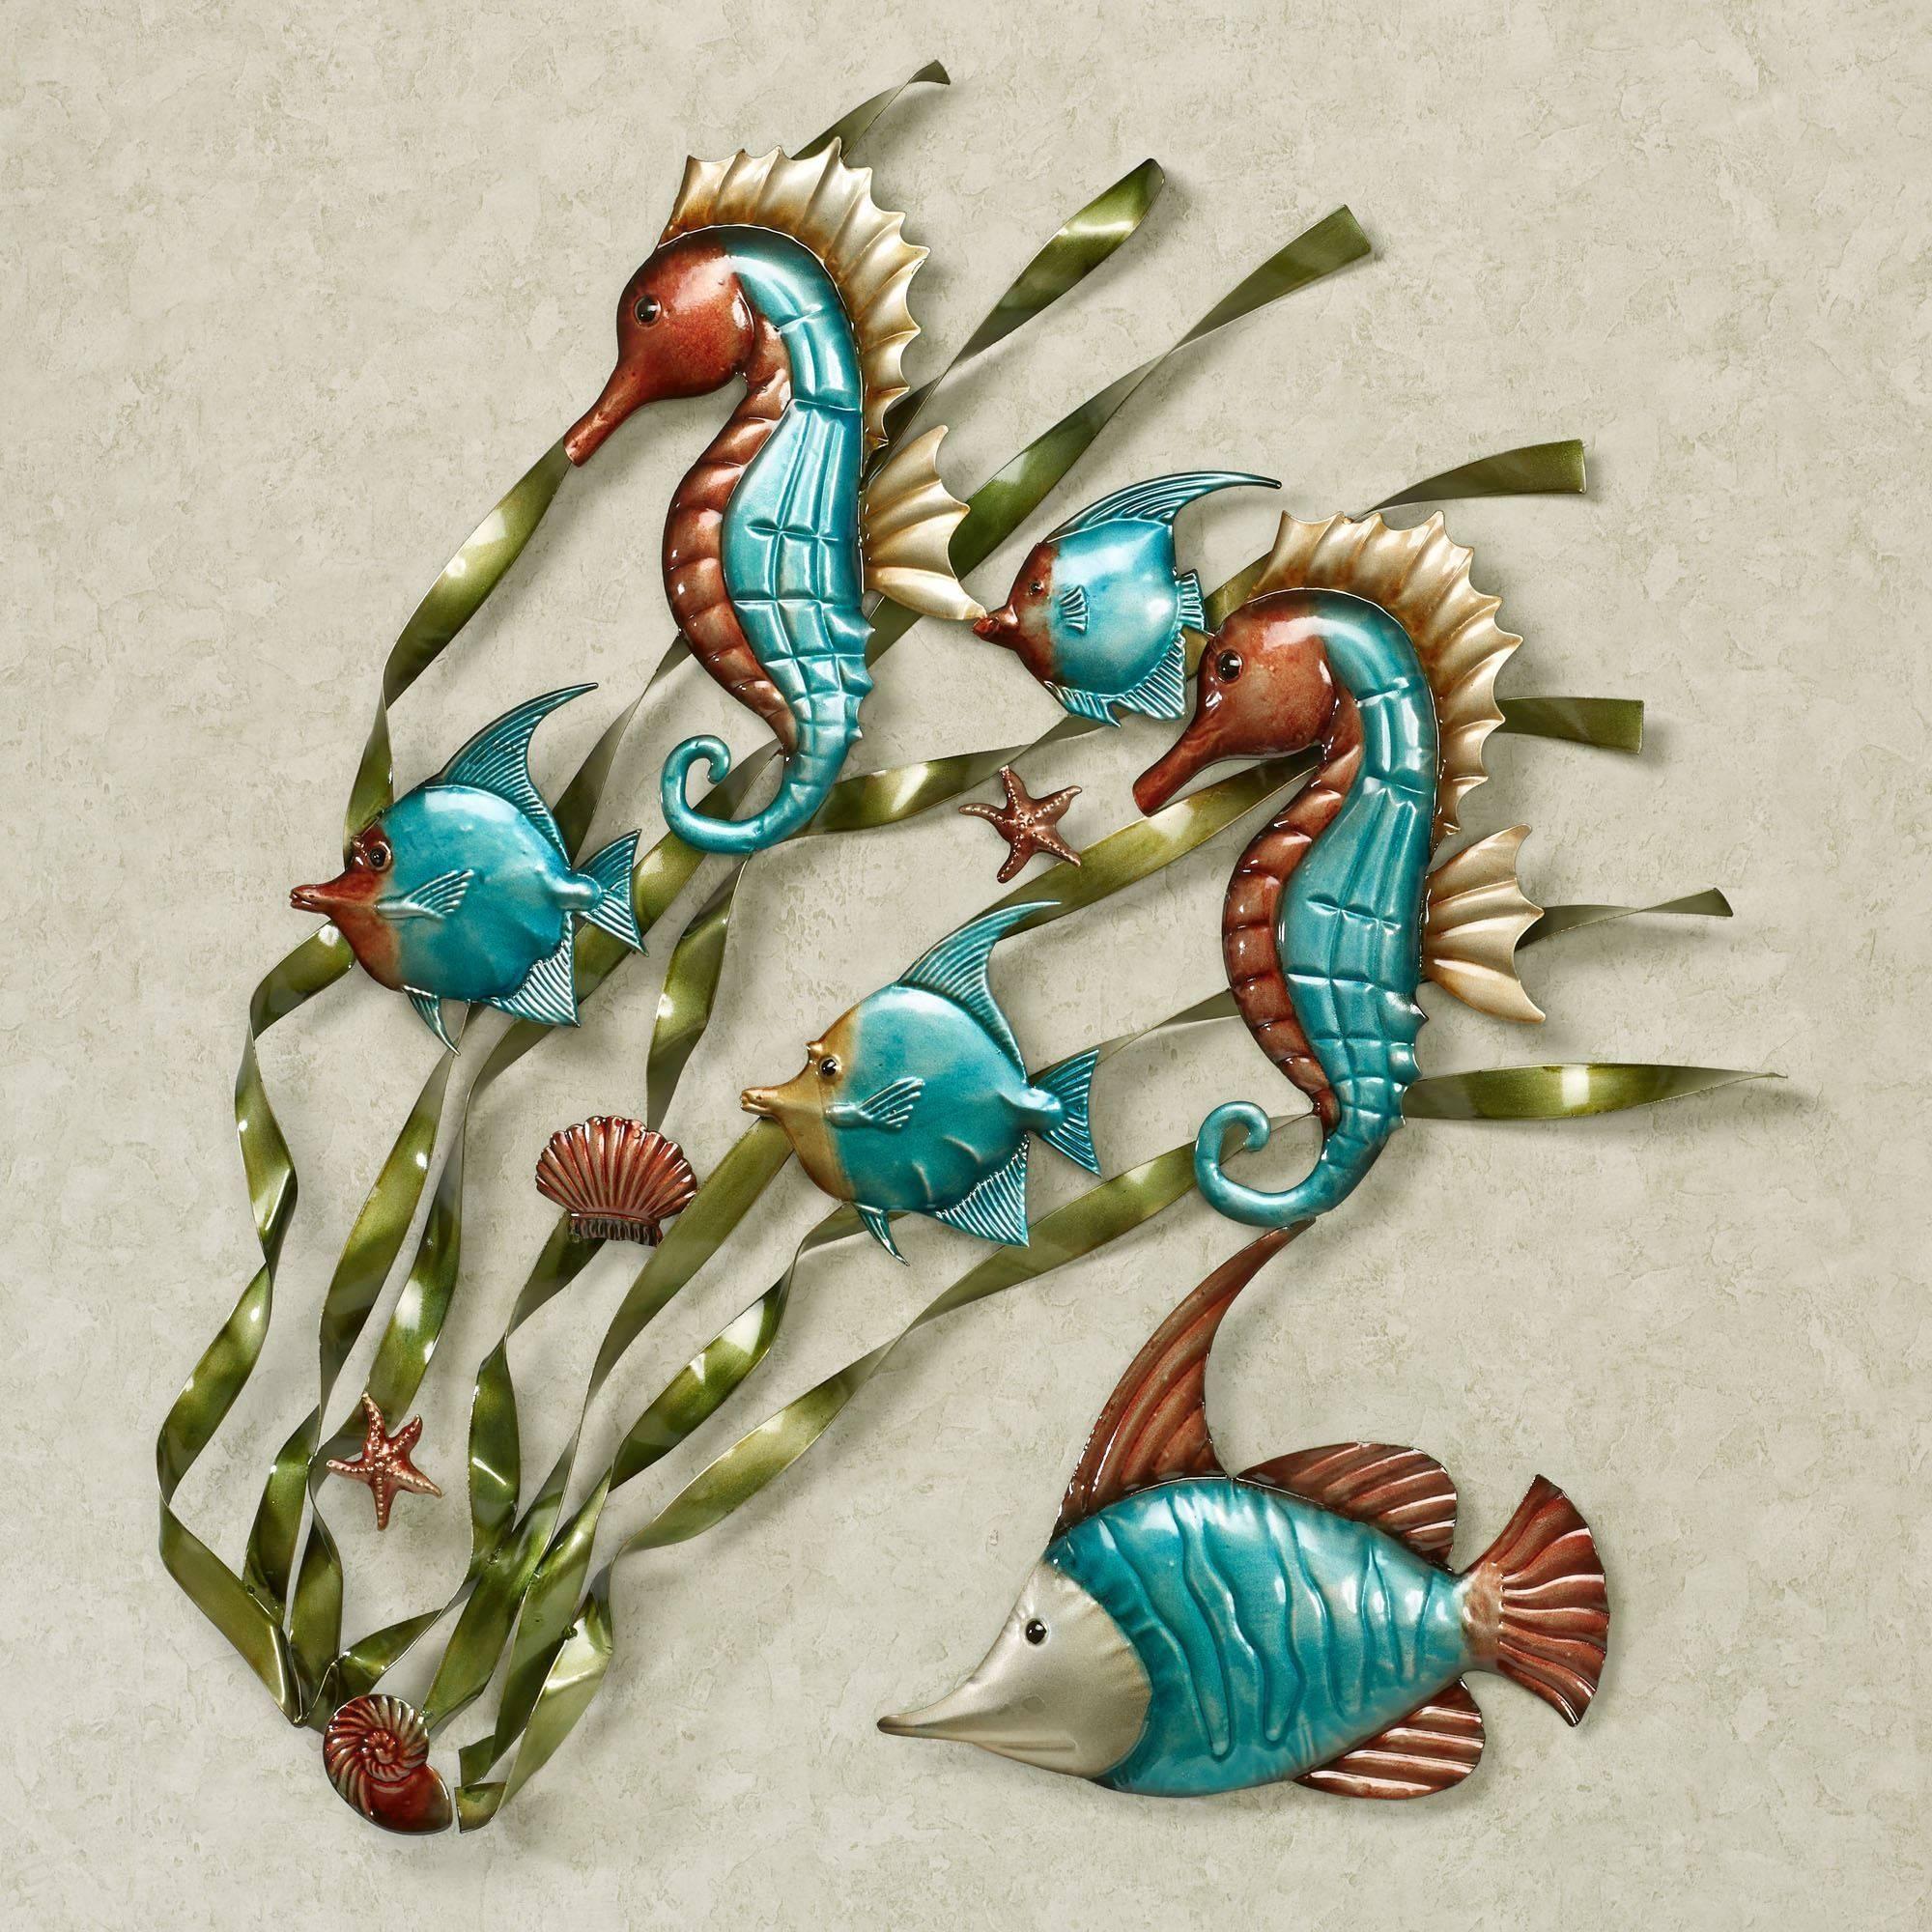 Deep Sea Fish And Seahorse Metal Wall Art With 2018 MetalCoastal Wall Art (View 7 of 20)